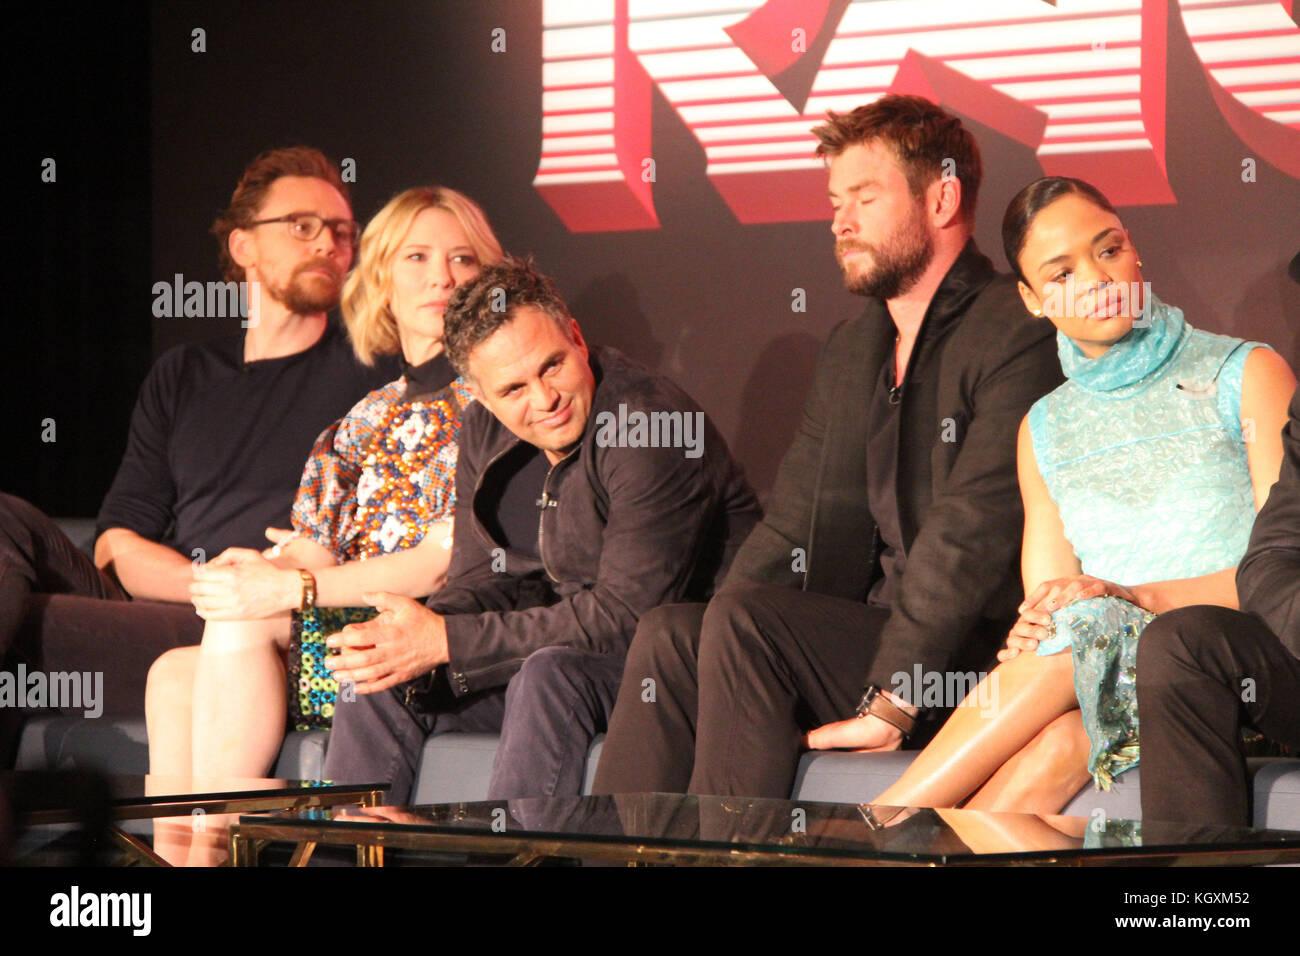 Tom Hiddleston, Cate Blanchett, Mark Ruffalo, Chris Hemsworth, Tessa Thompson  10/11/2017 'Thor: Ragnarok' - Stock Image